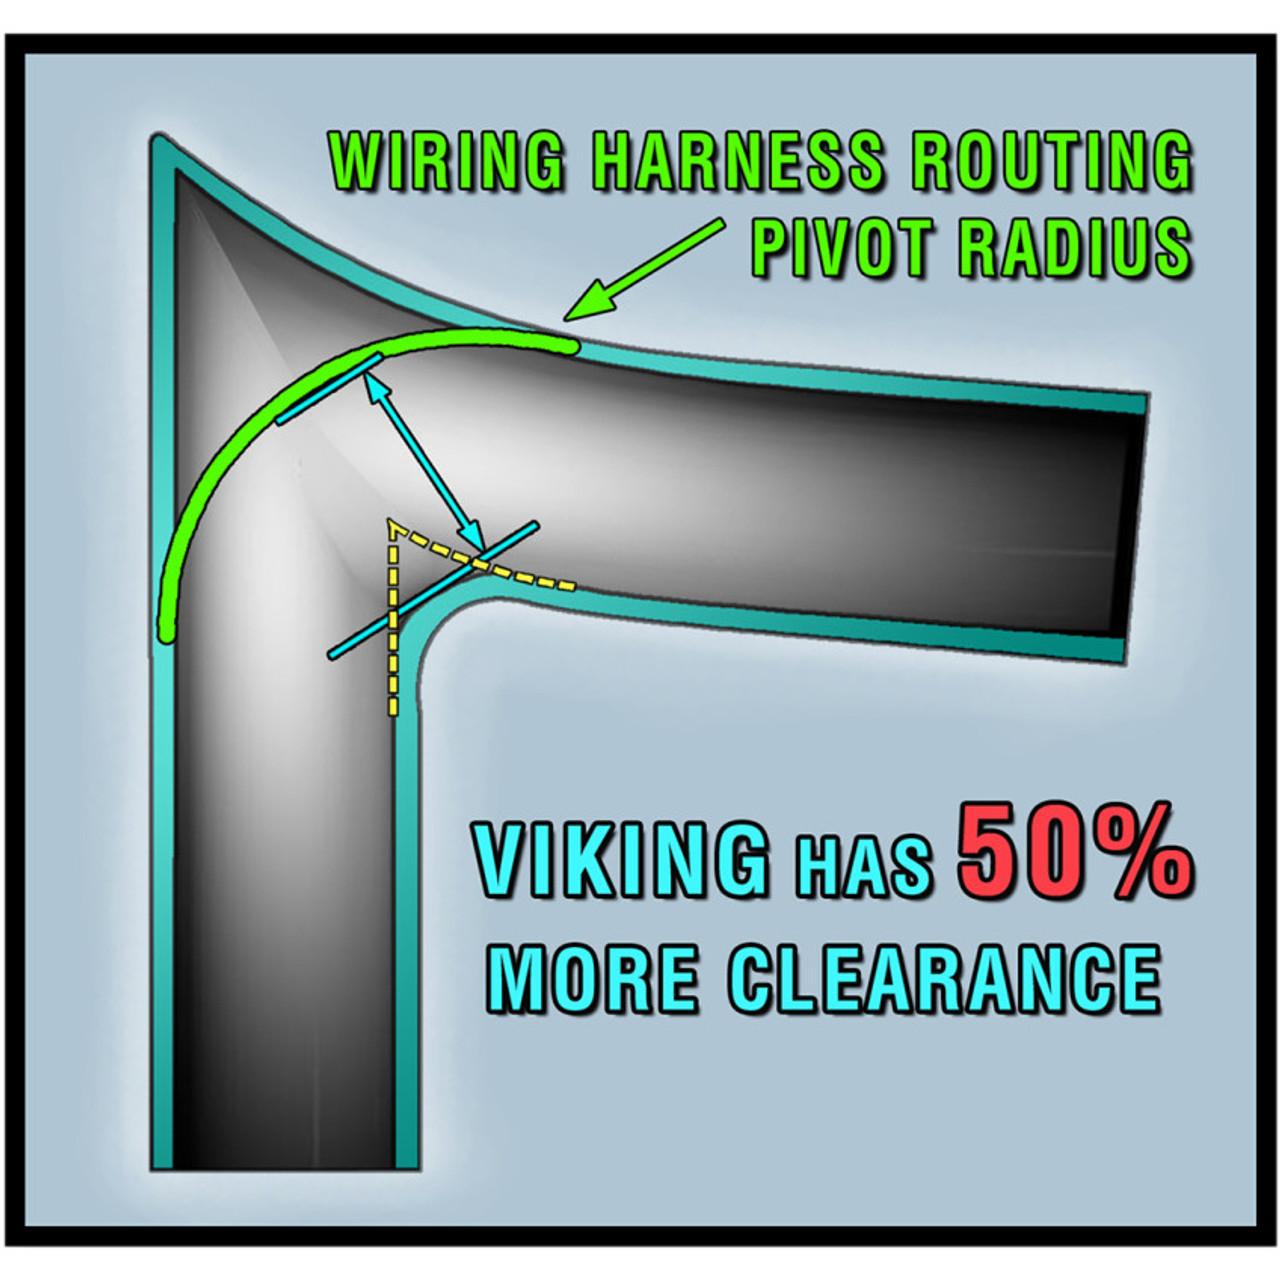 magnum 1 1 4 viking handlebars for 1996 2018 harley touring  [ 1280 x 1280 Pixel ]